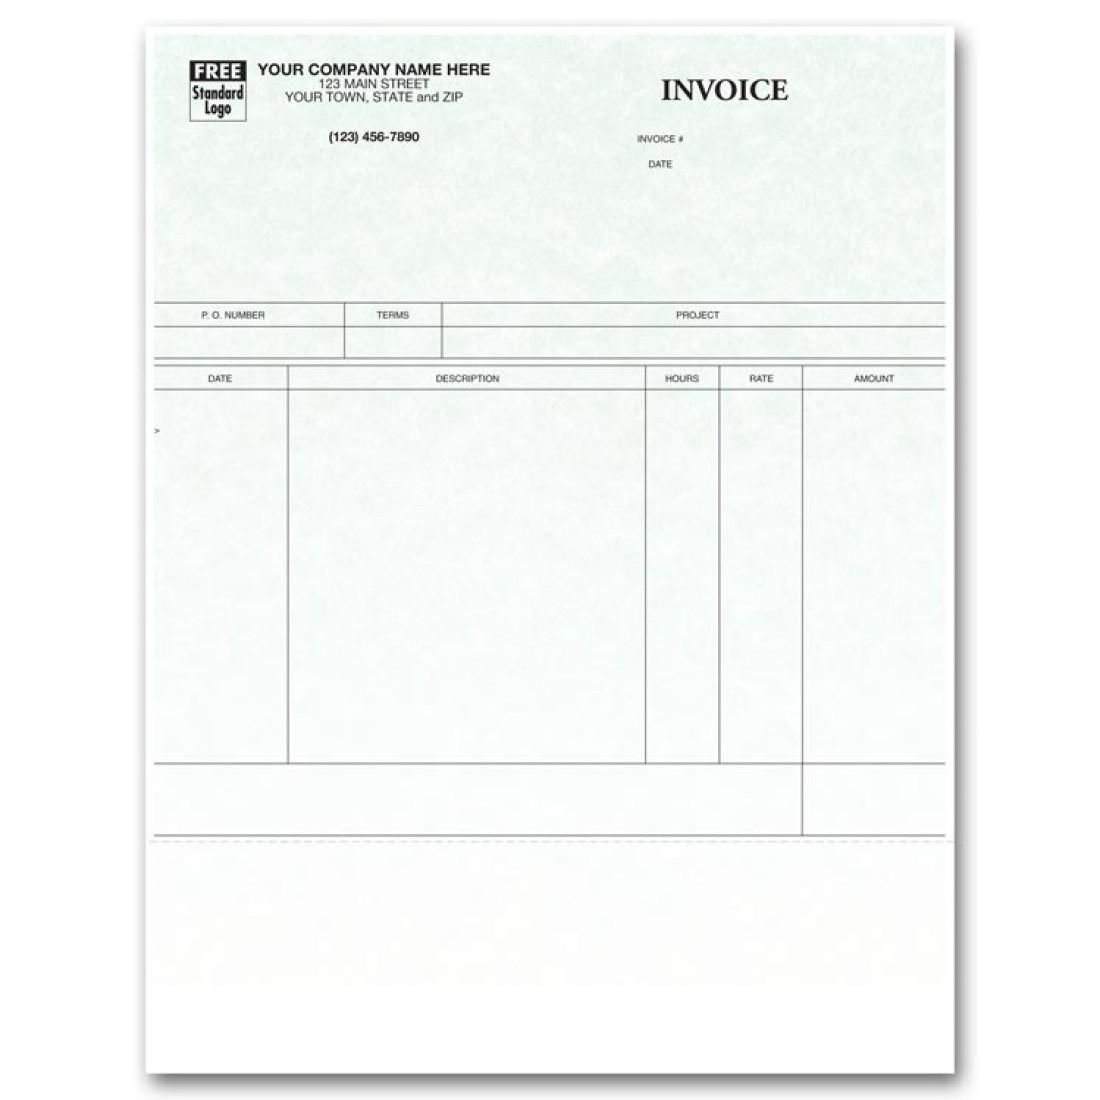 Laser Service Invoice for ProVenture - Parchment